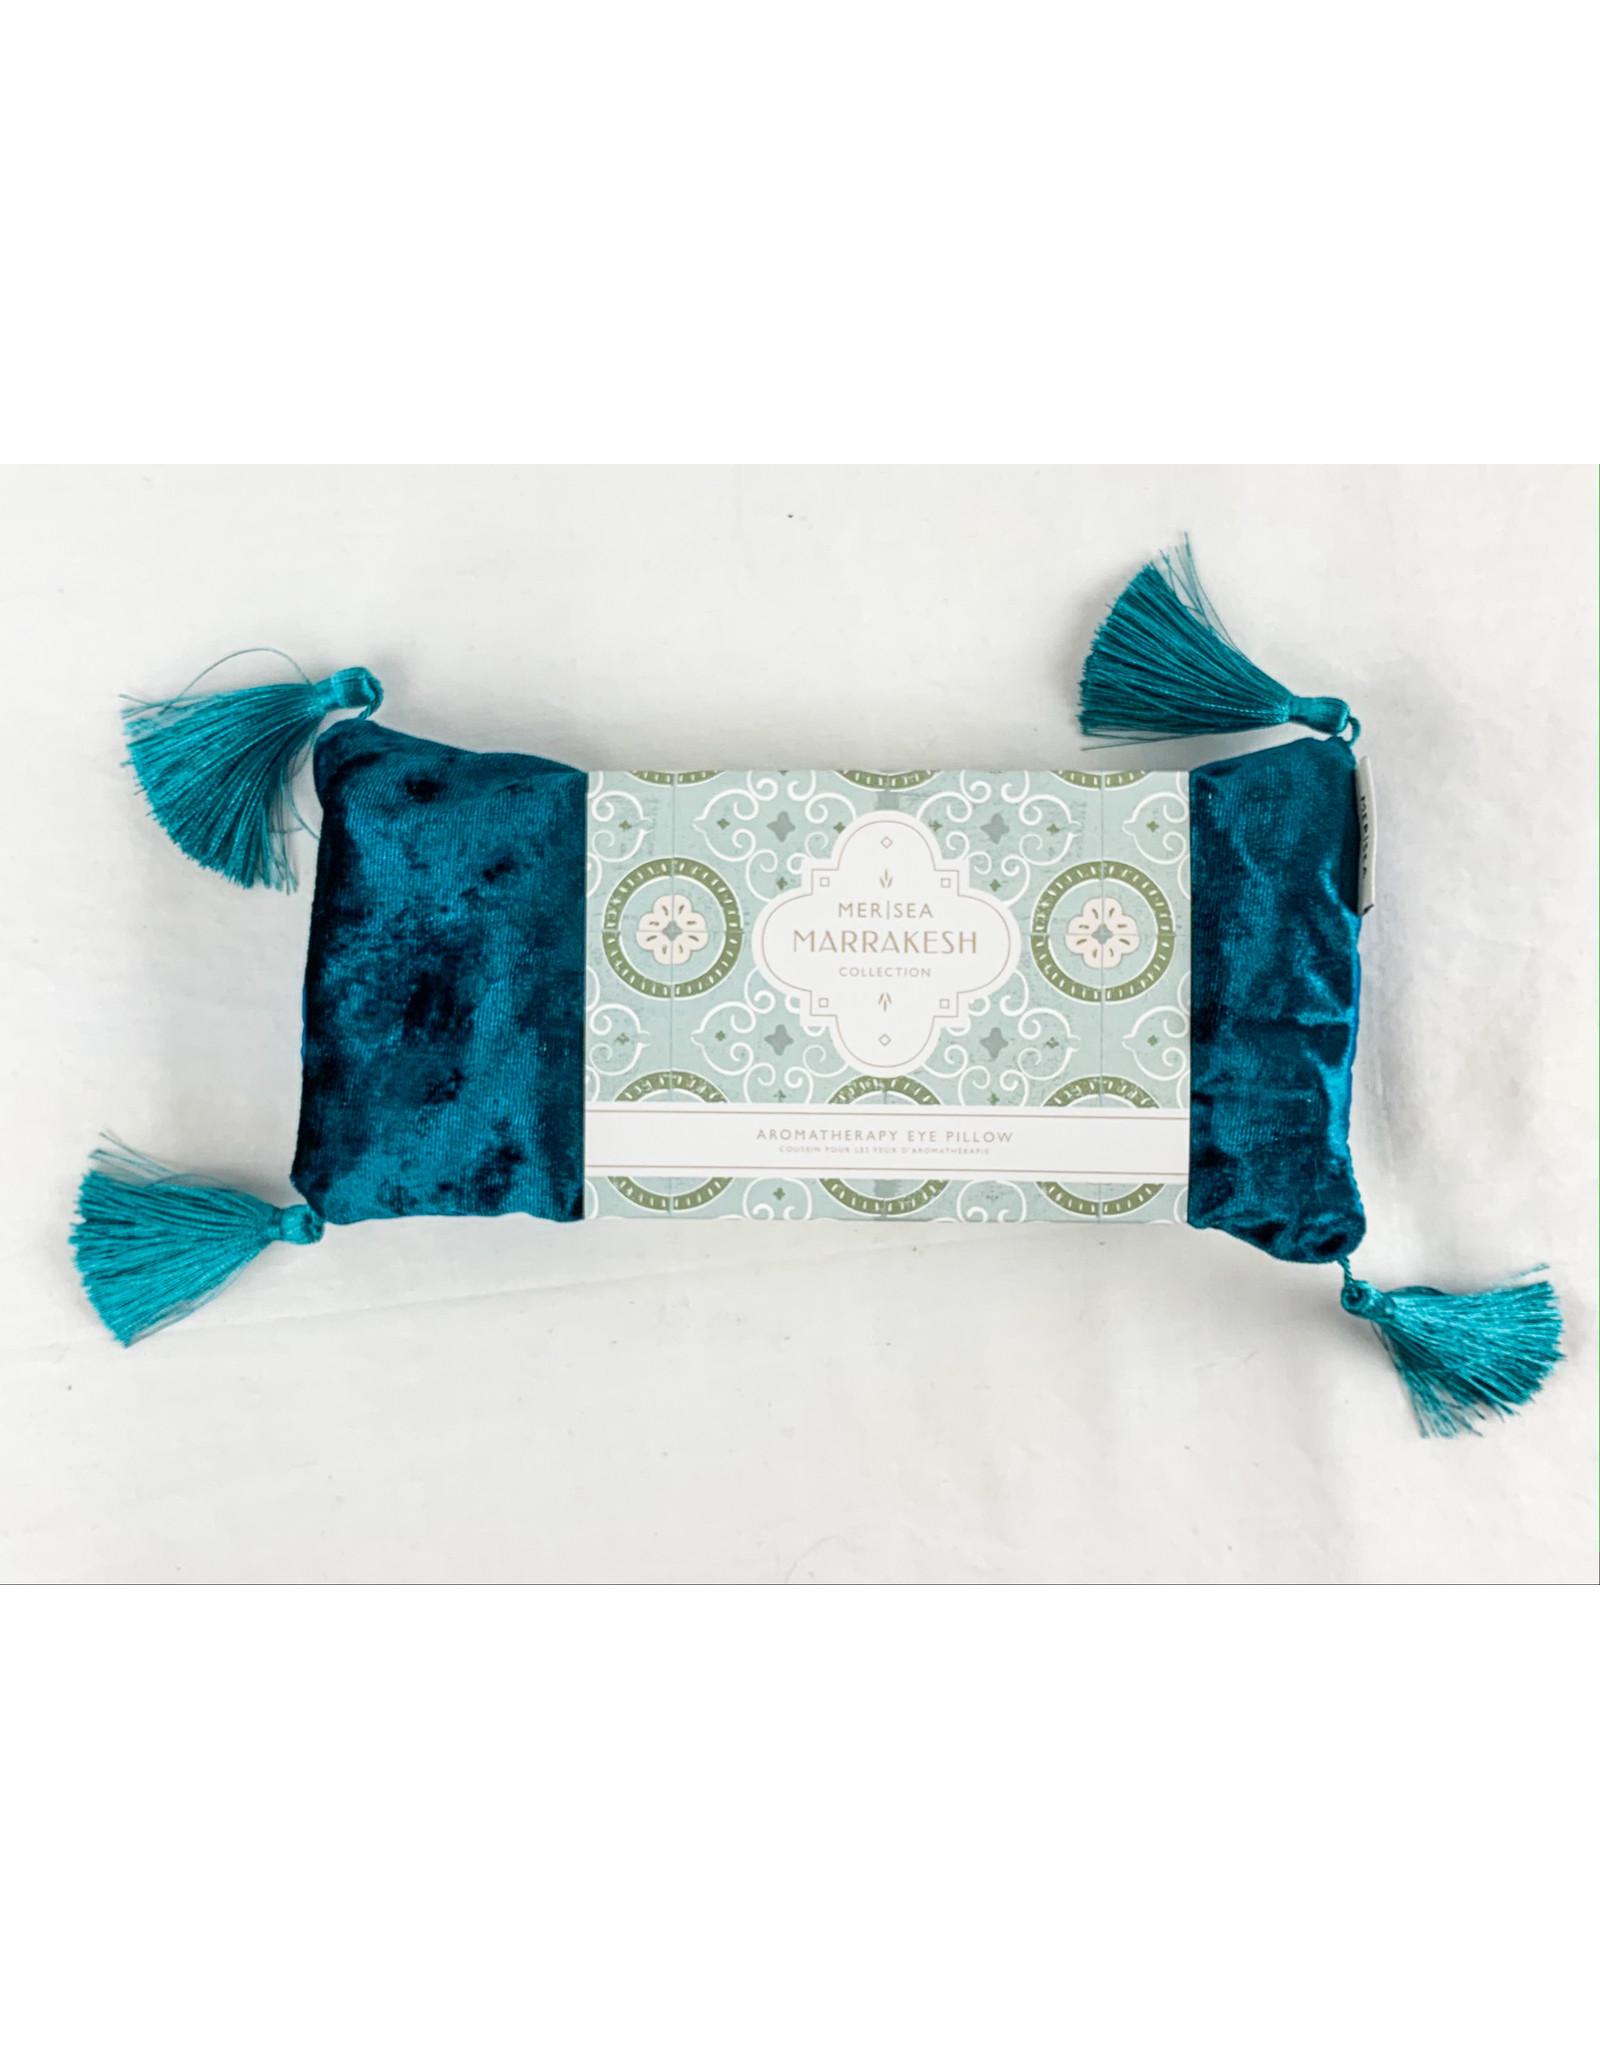 Mer Sea Moraccan Mint Eye Pillow